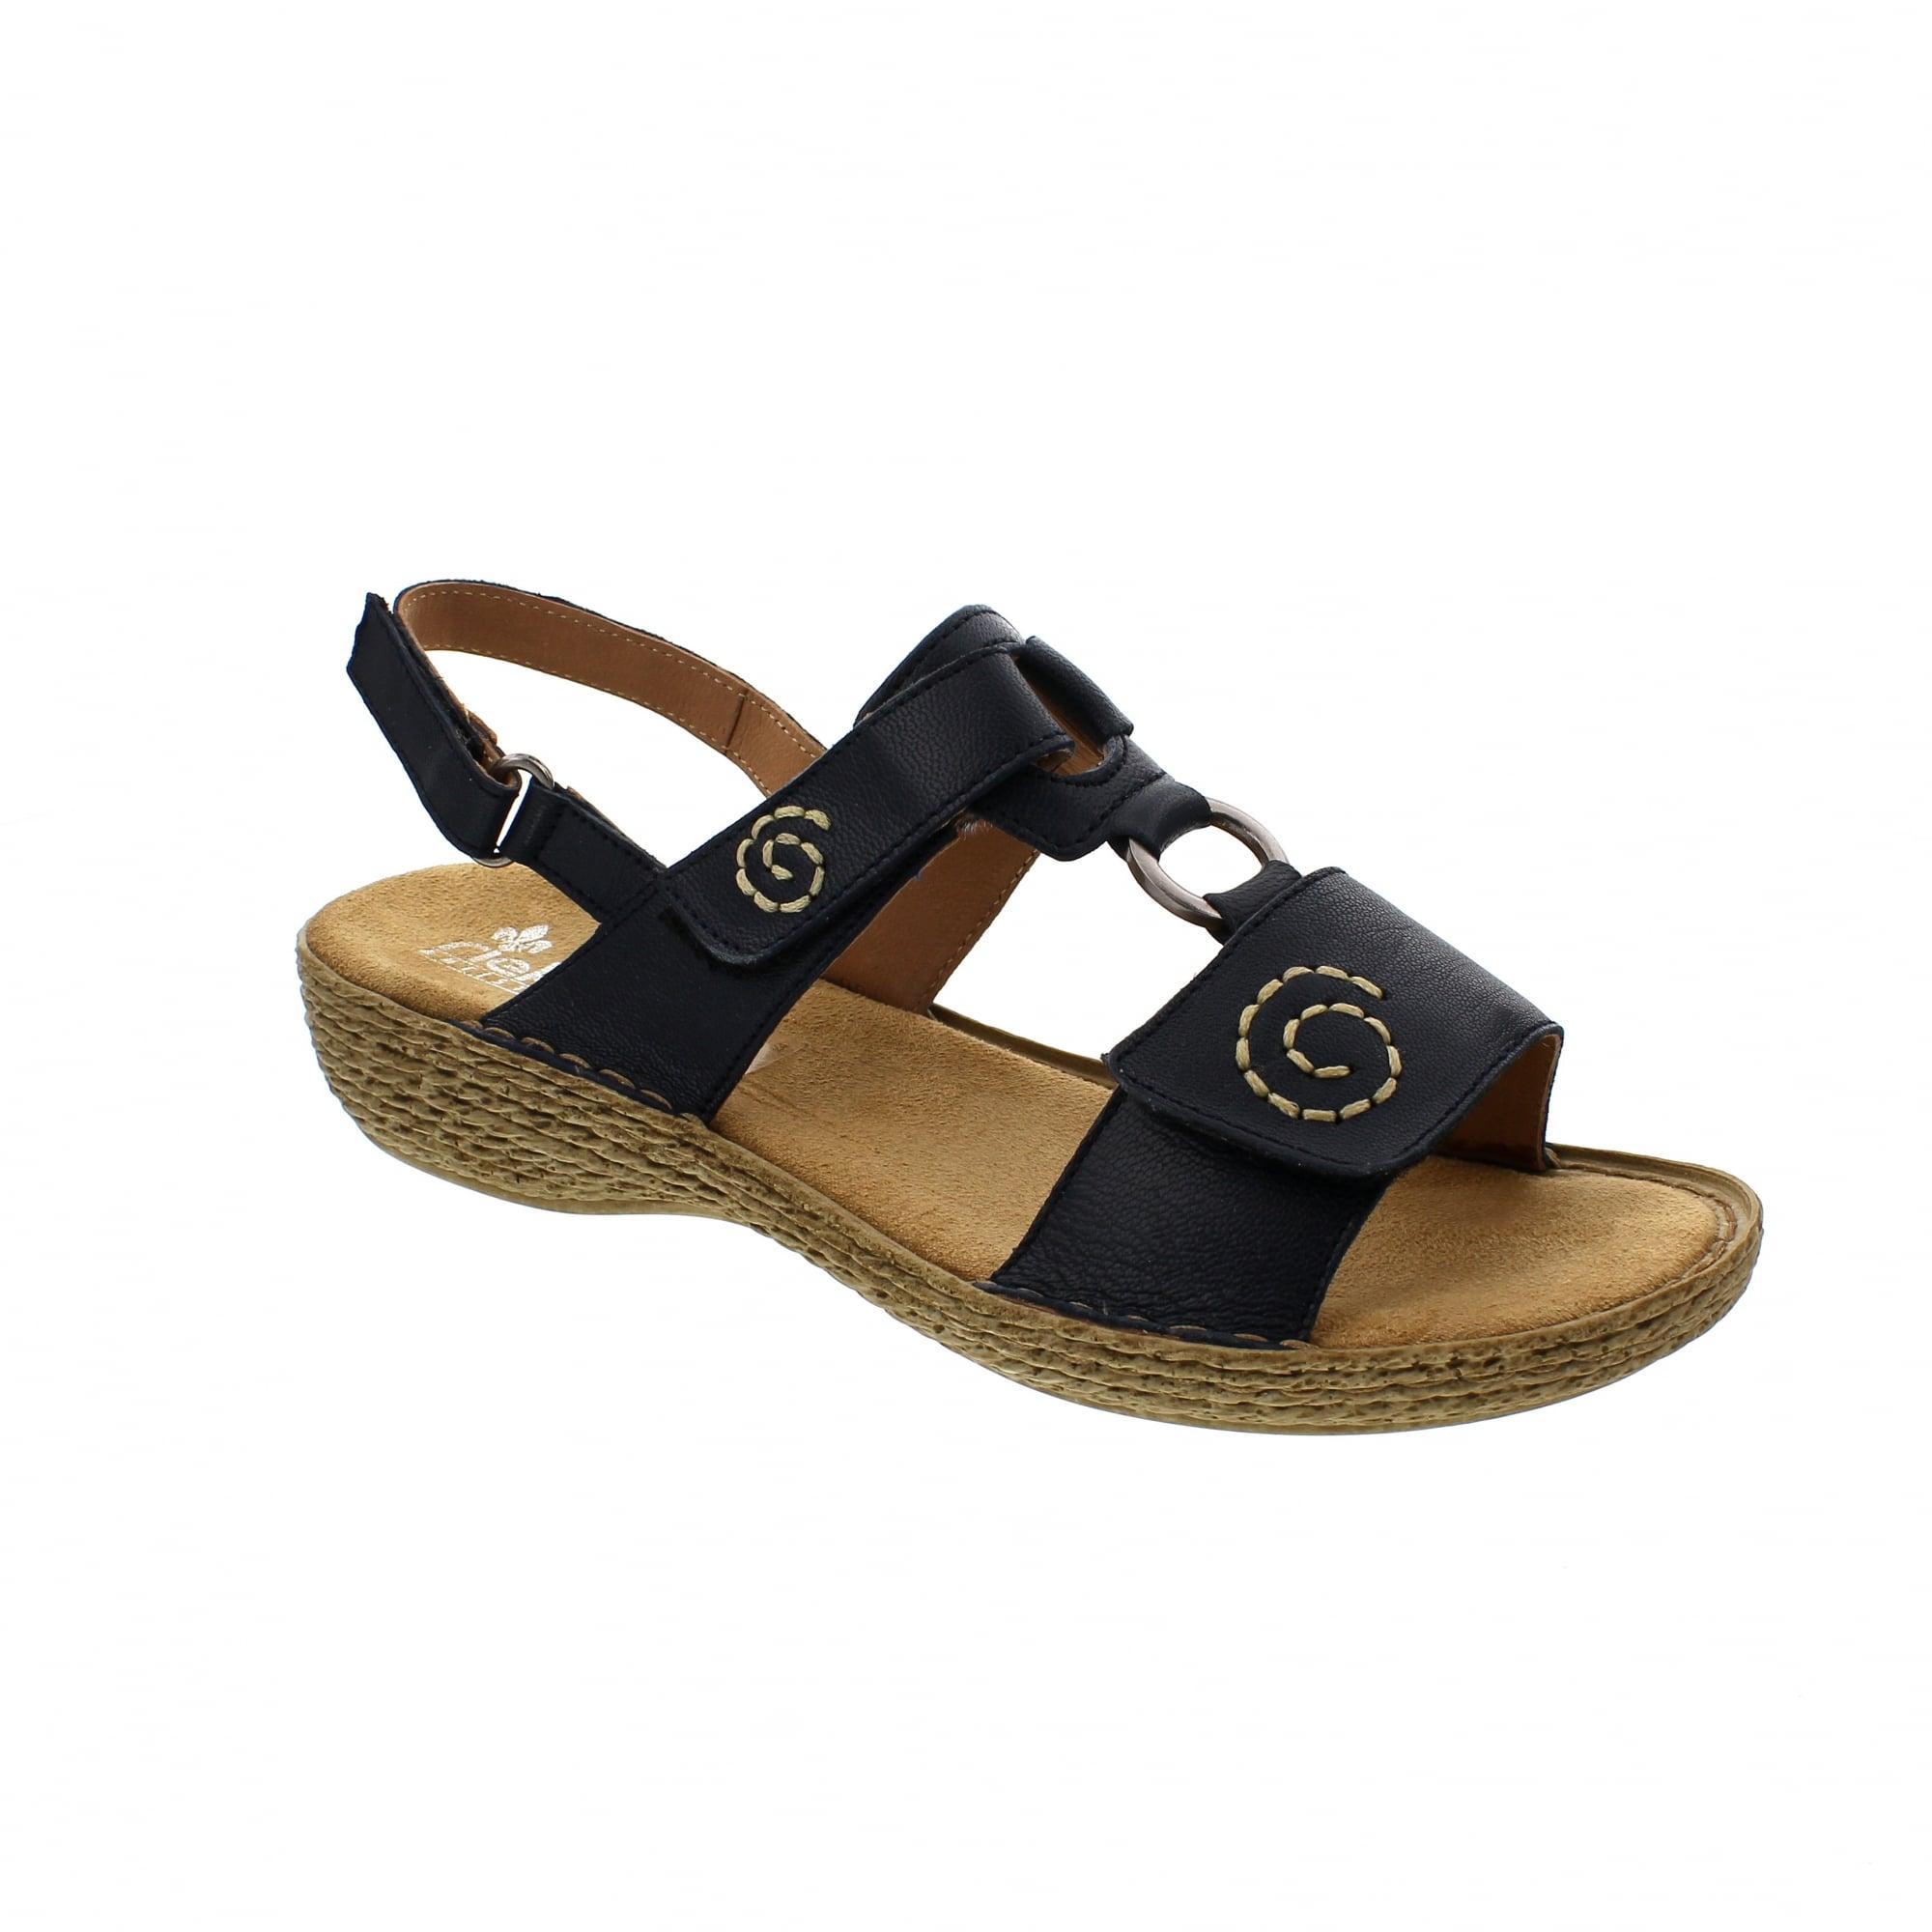 47bafb9dacc4 Rieker 65863-14 Navy Leather Womens Sandals